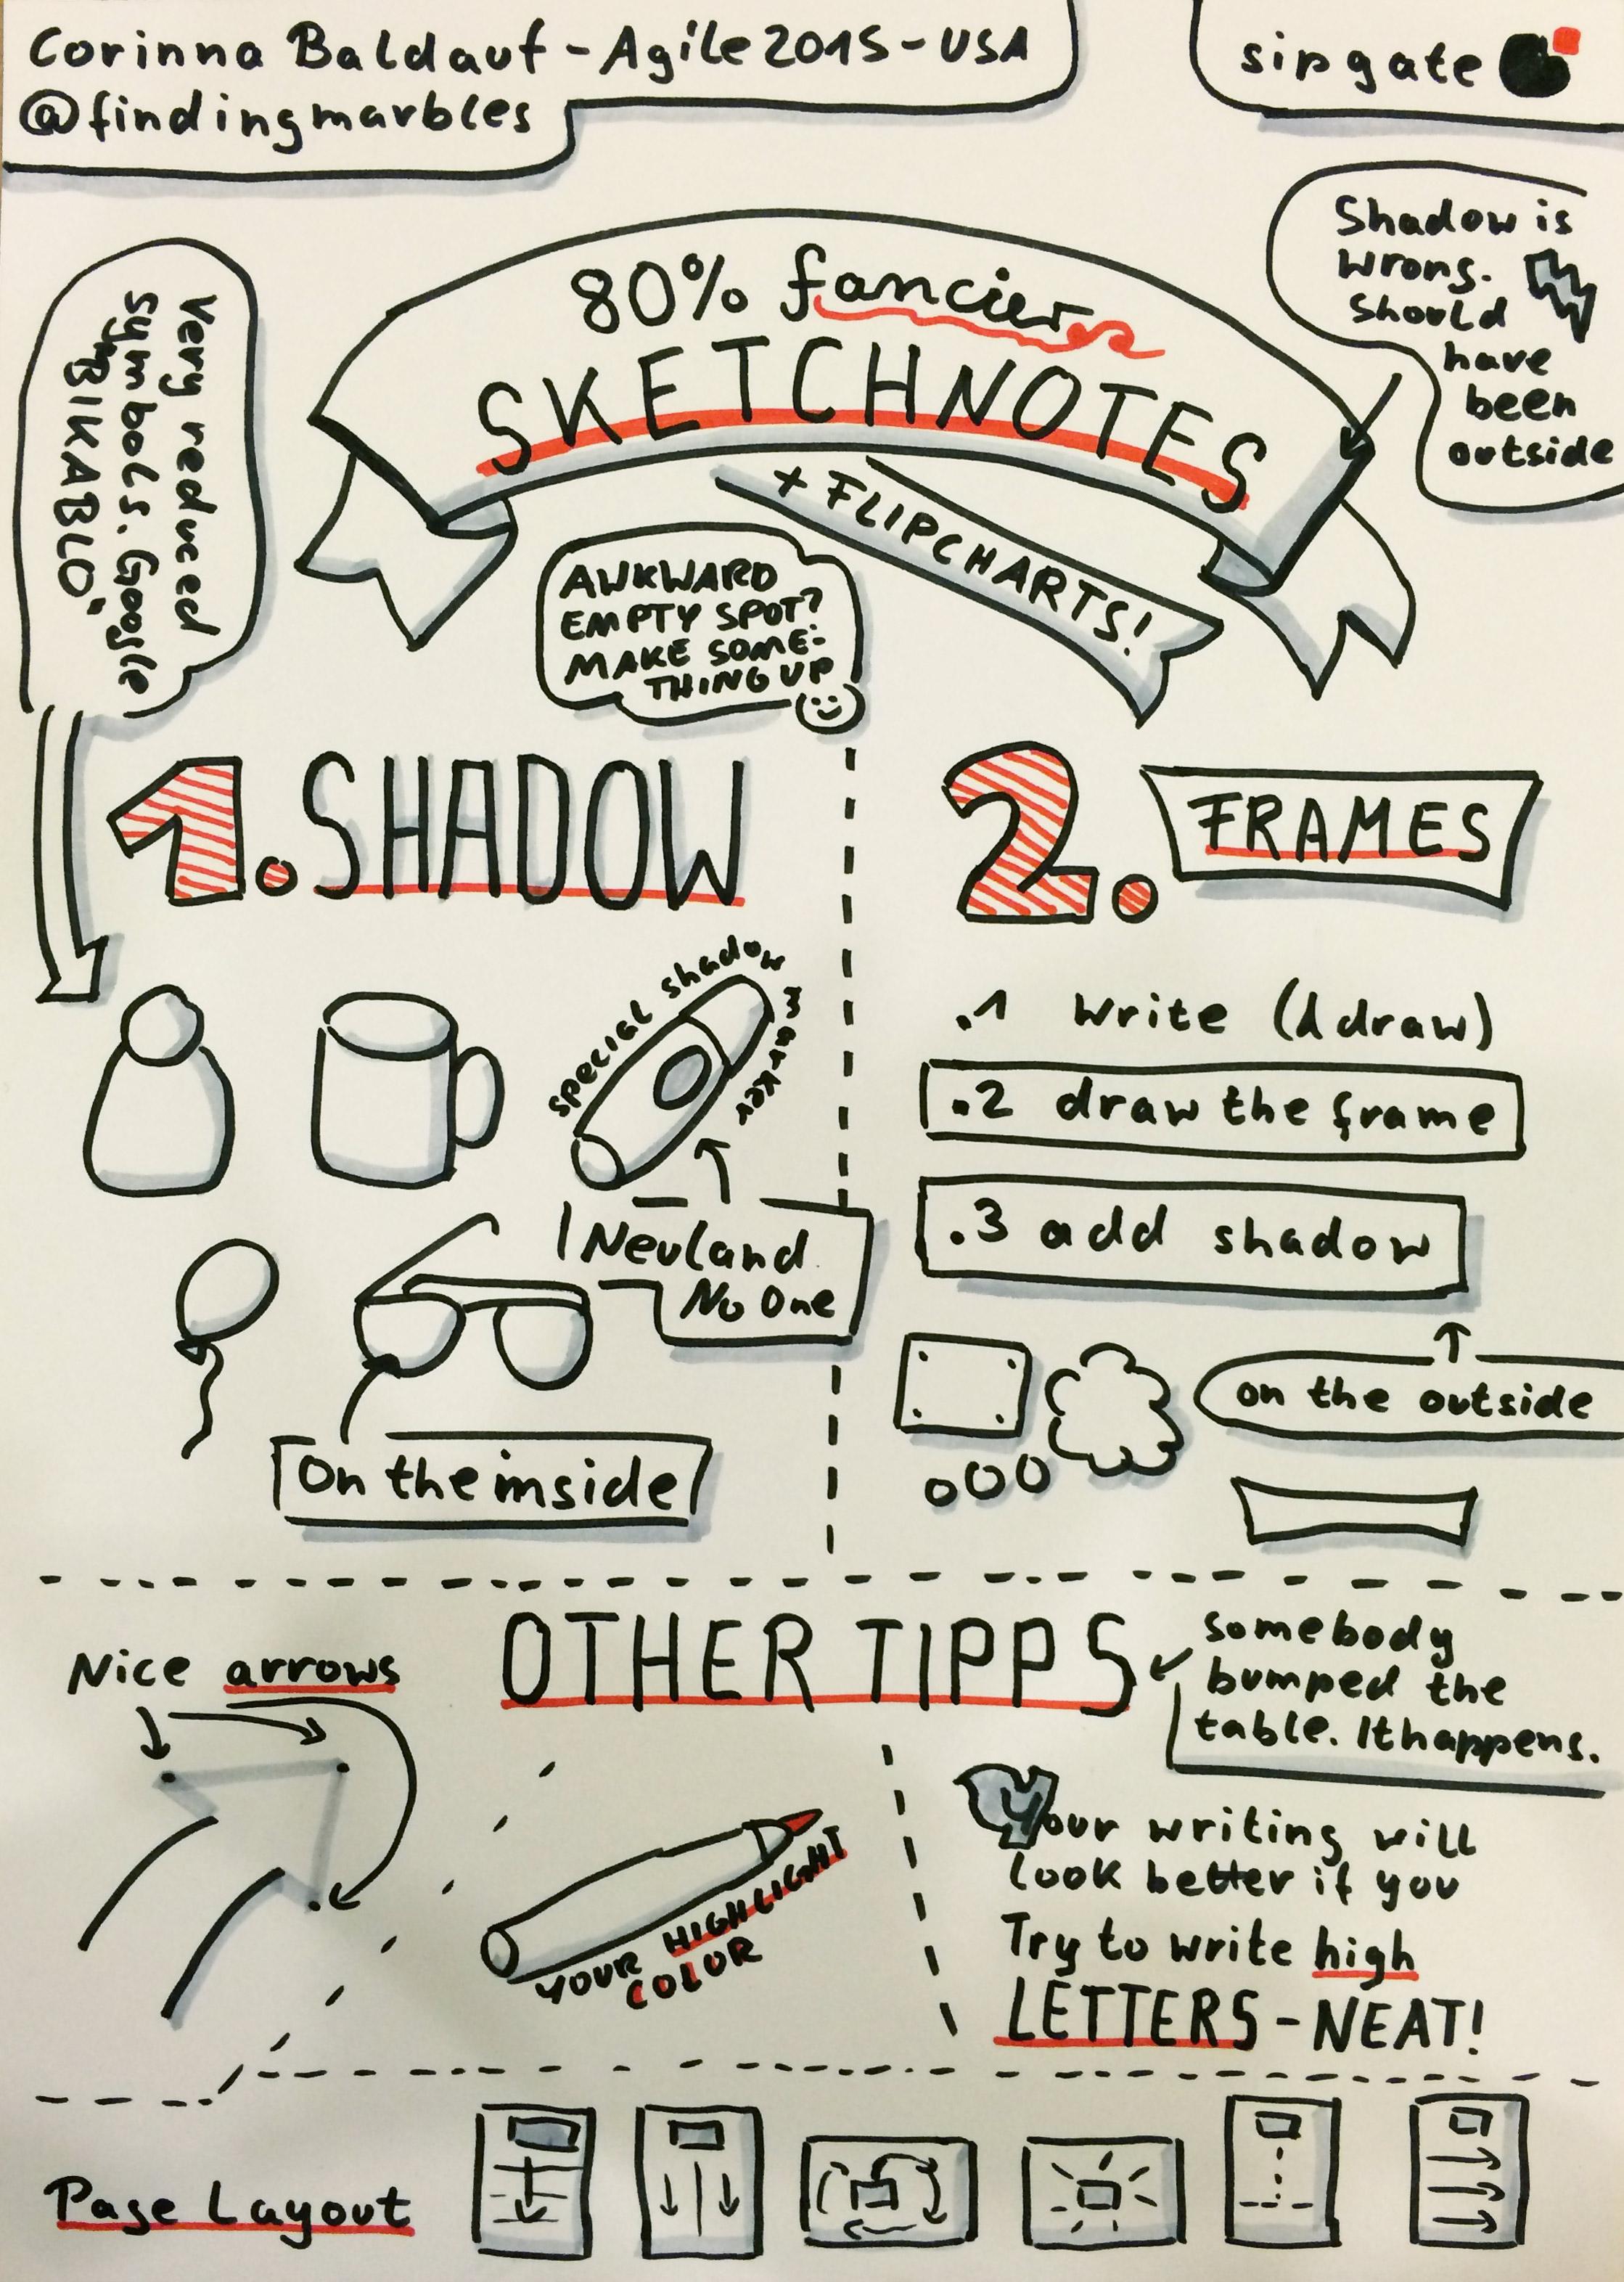 sketchnote_sketchnotes